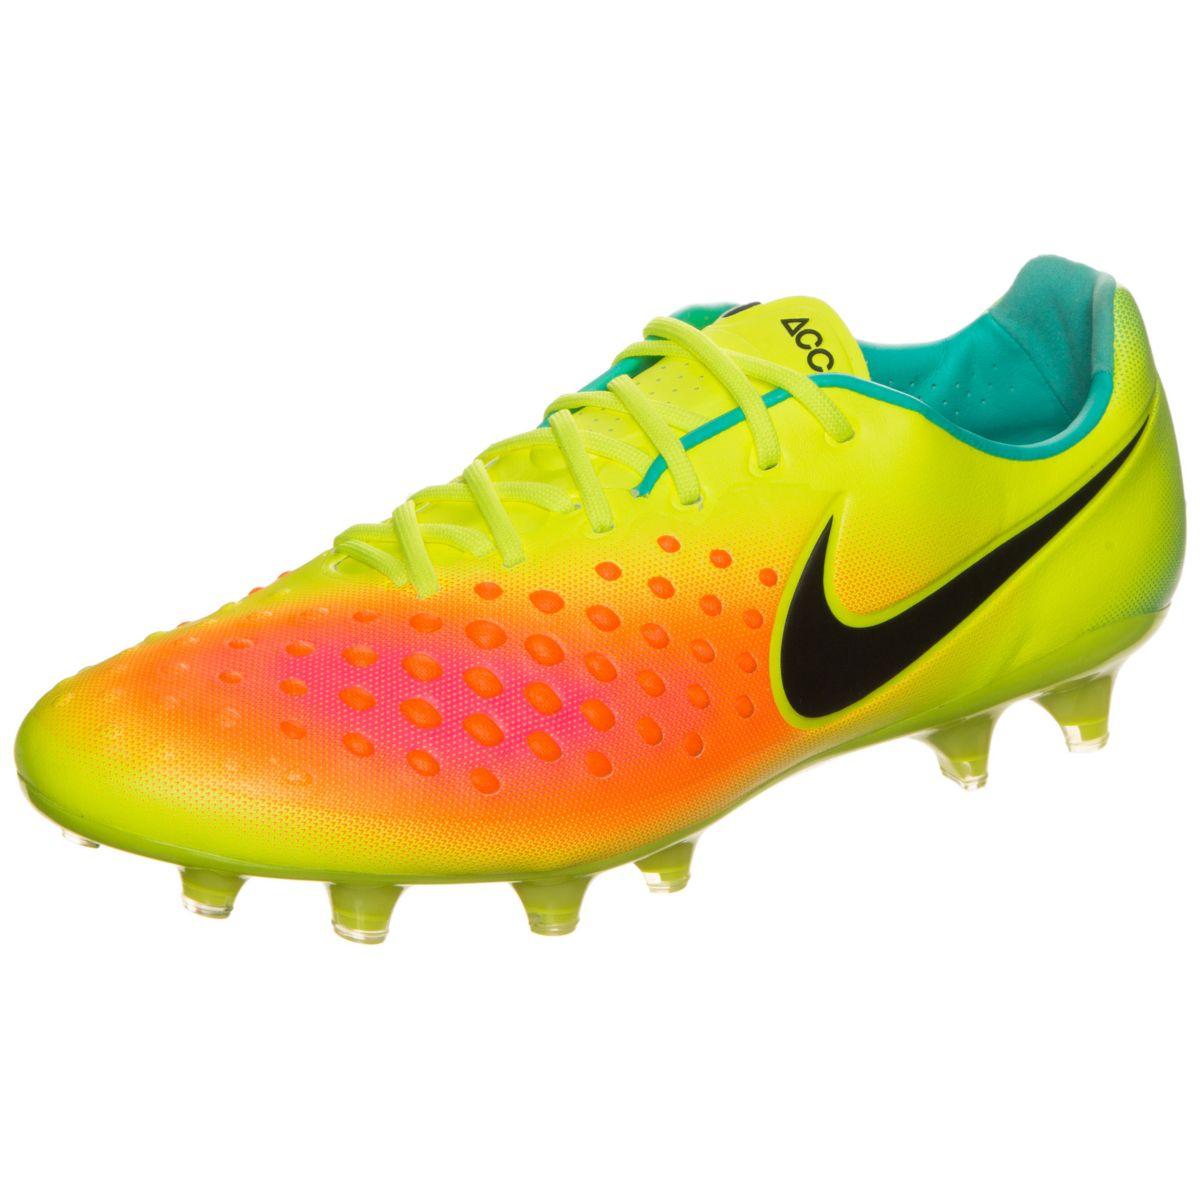 Nike Magista Opus II FG Fußballschuh Herren Preisvergleich